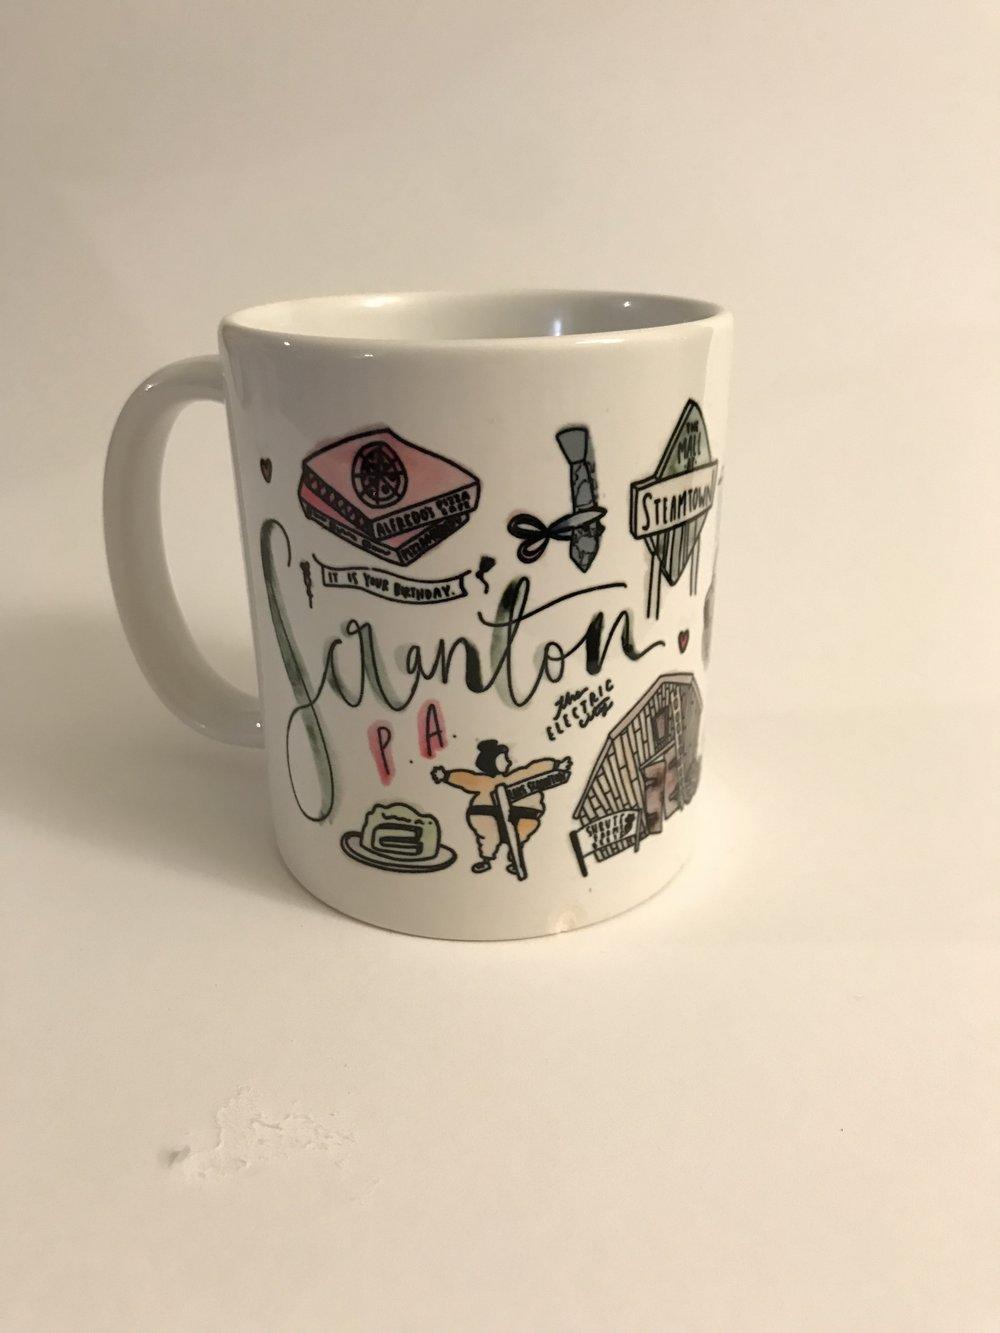 The office coffee mug Etsy Pa The Office Coffee Mug Img6198jpg Signet Sealed Scranton Pa The Office Coffee Mug Signet Sealed